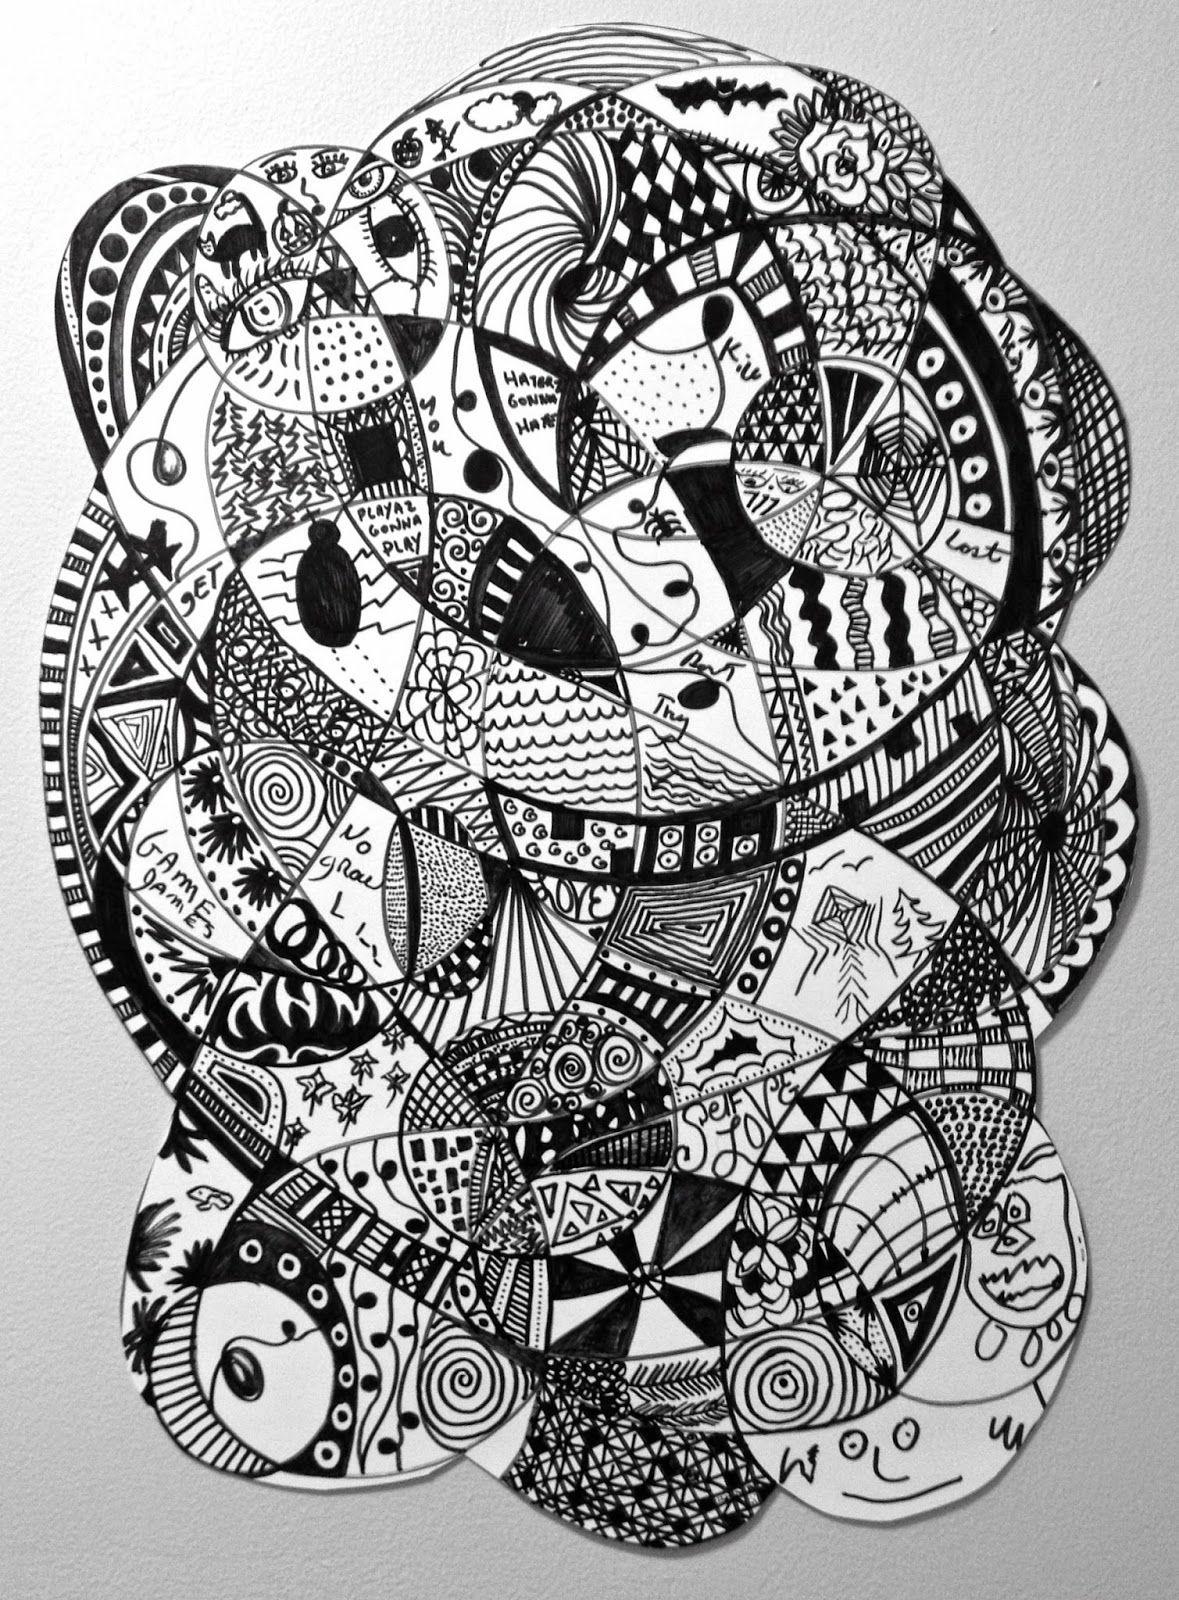 The Newest 20x24 Inch Zentangle From Cynthia Emerlye S Art